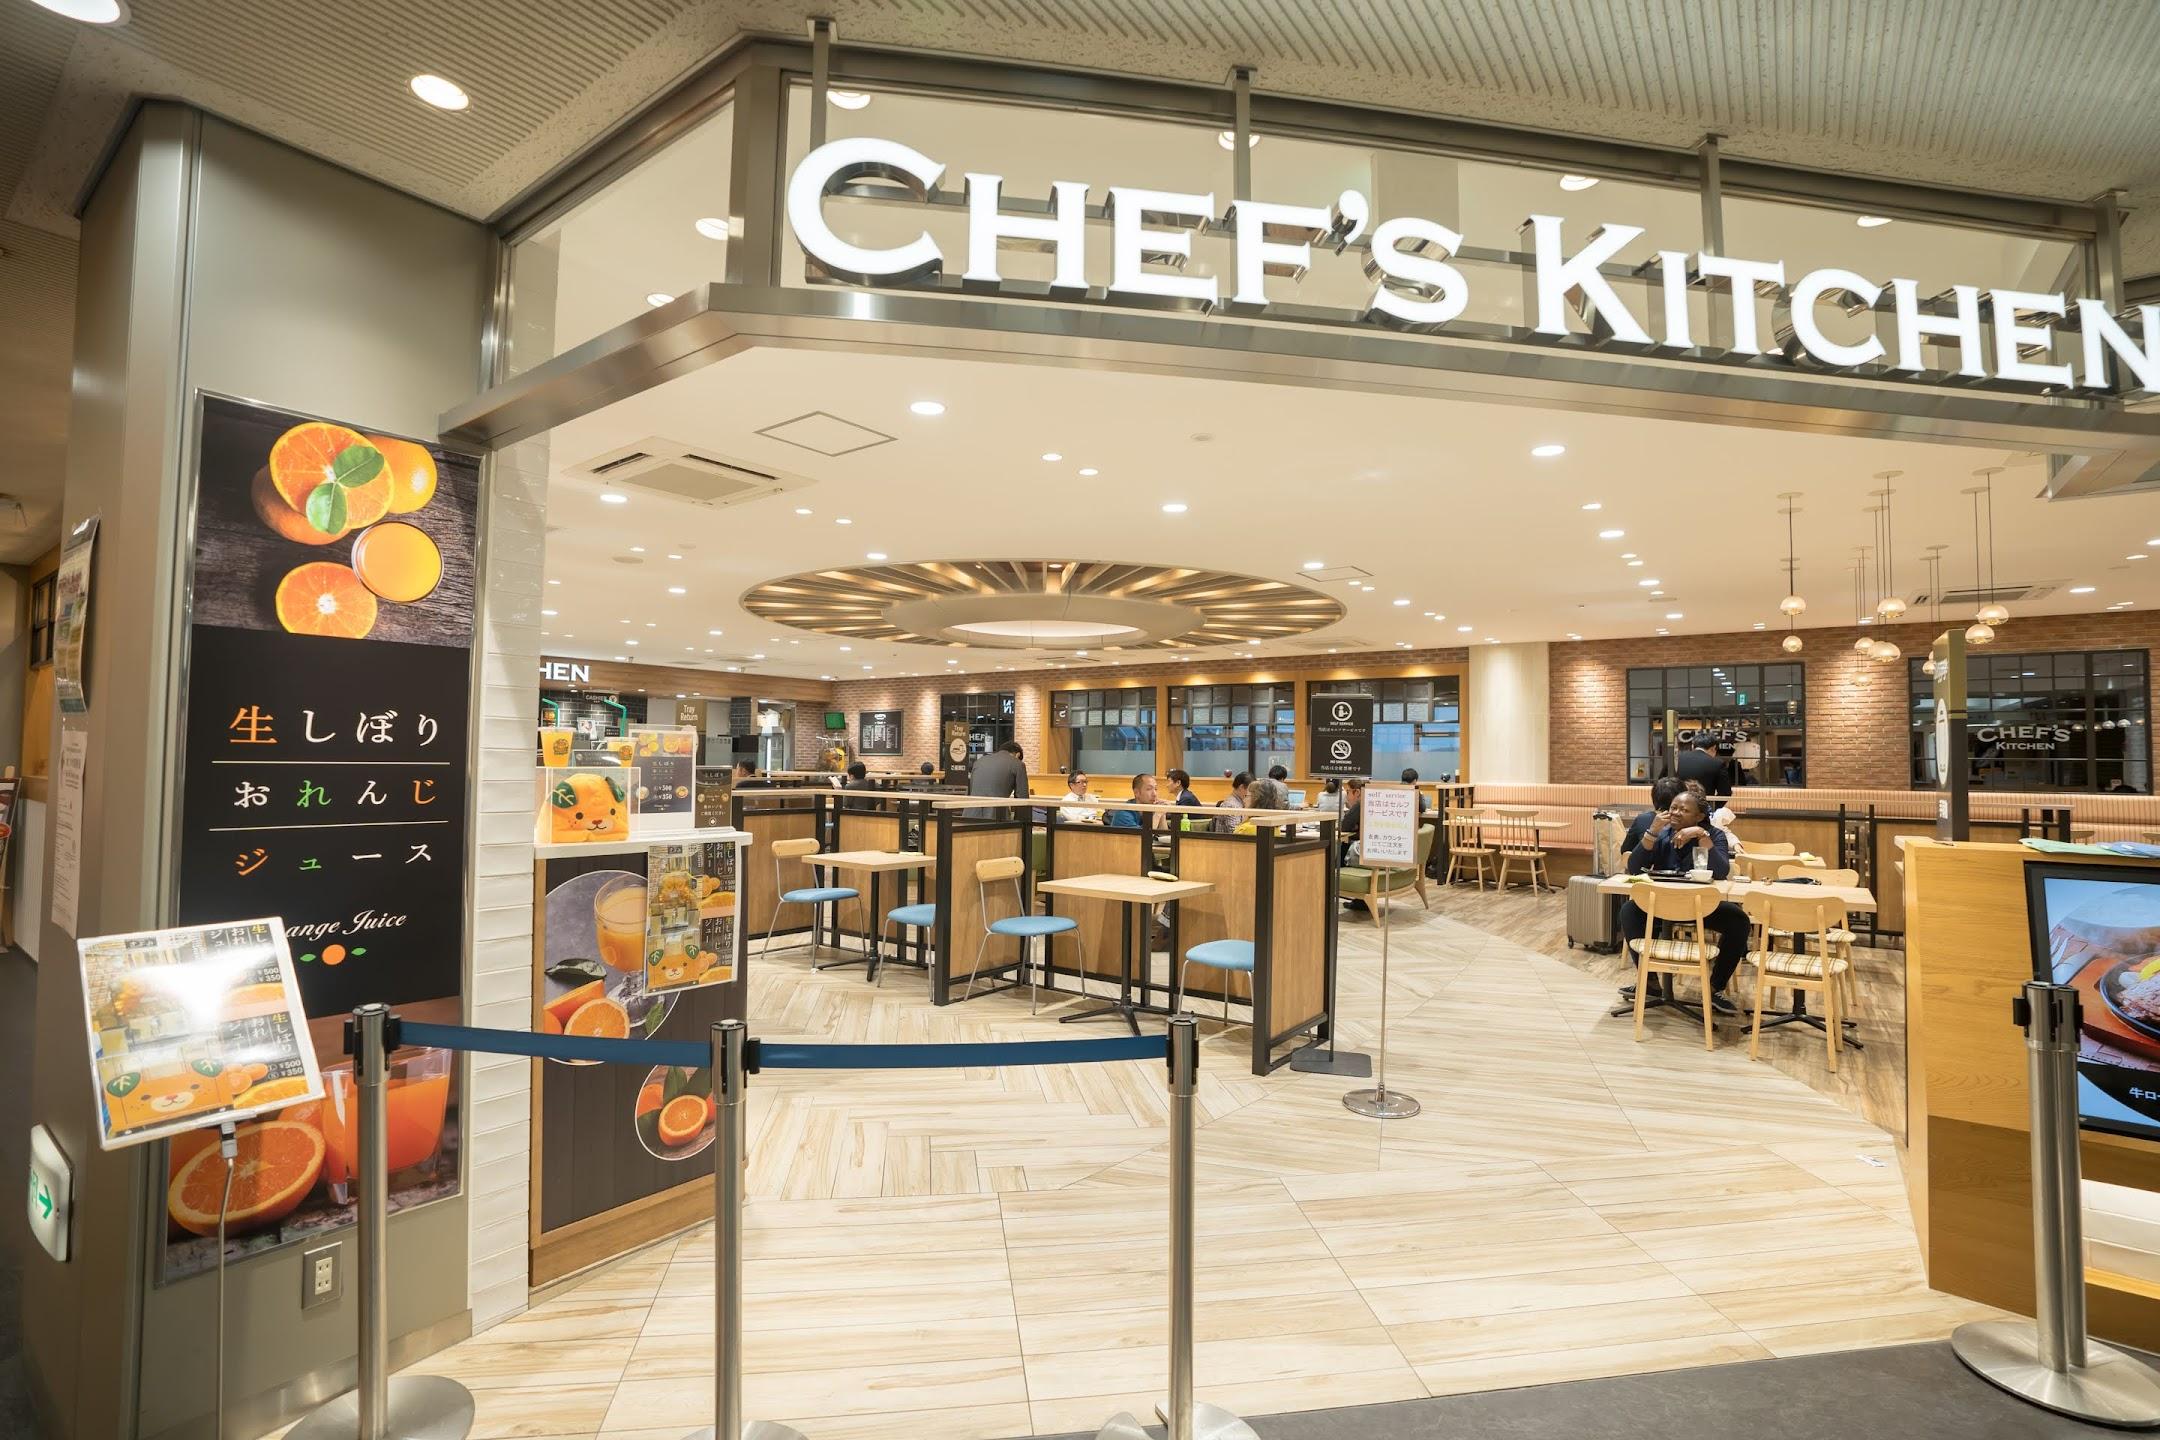 松山空港 CHEF'S KITCHEN